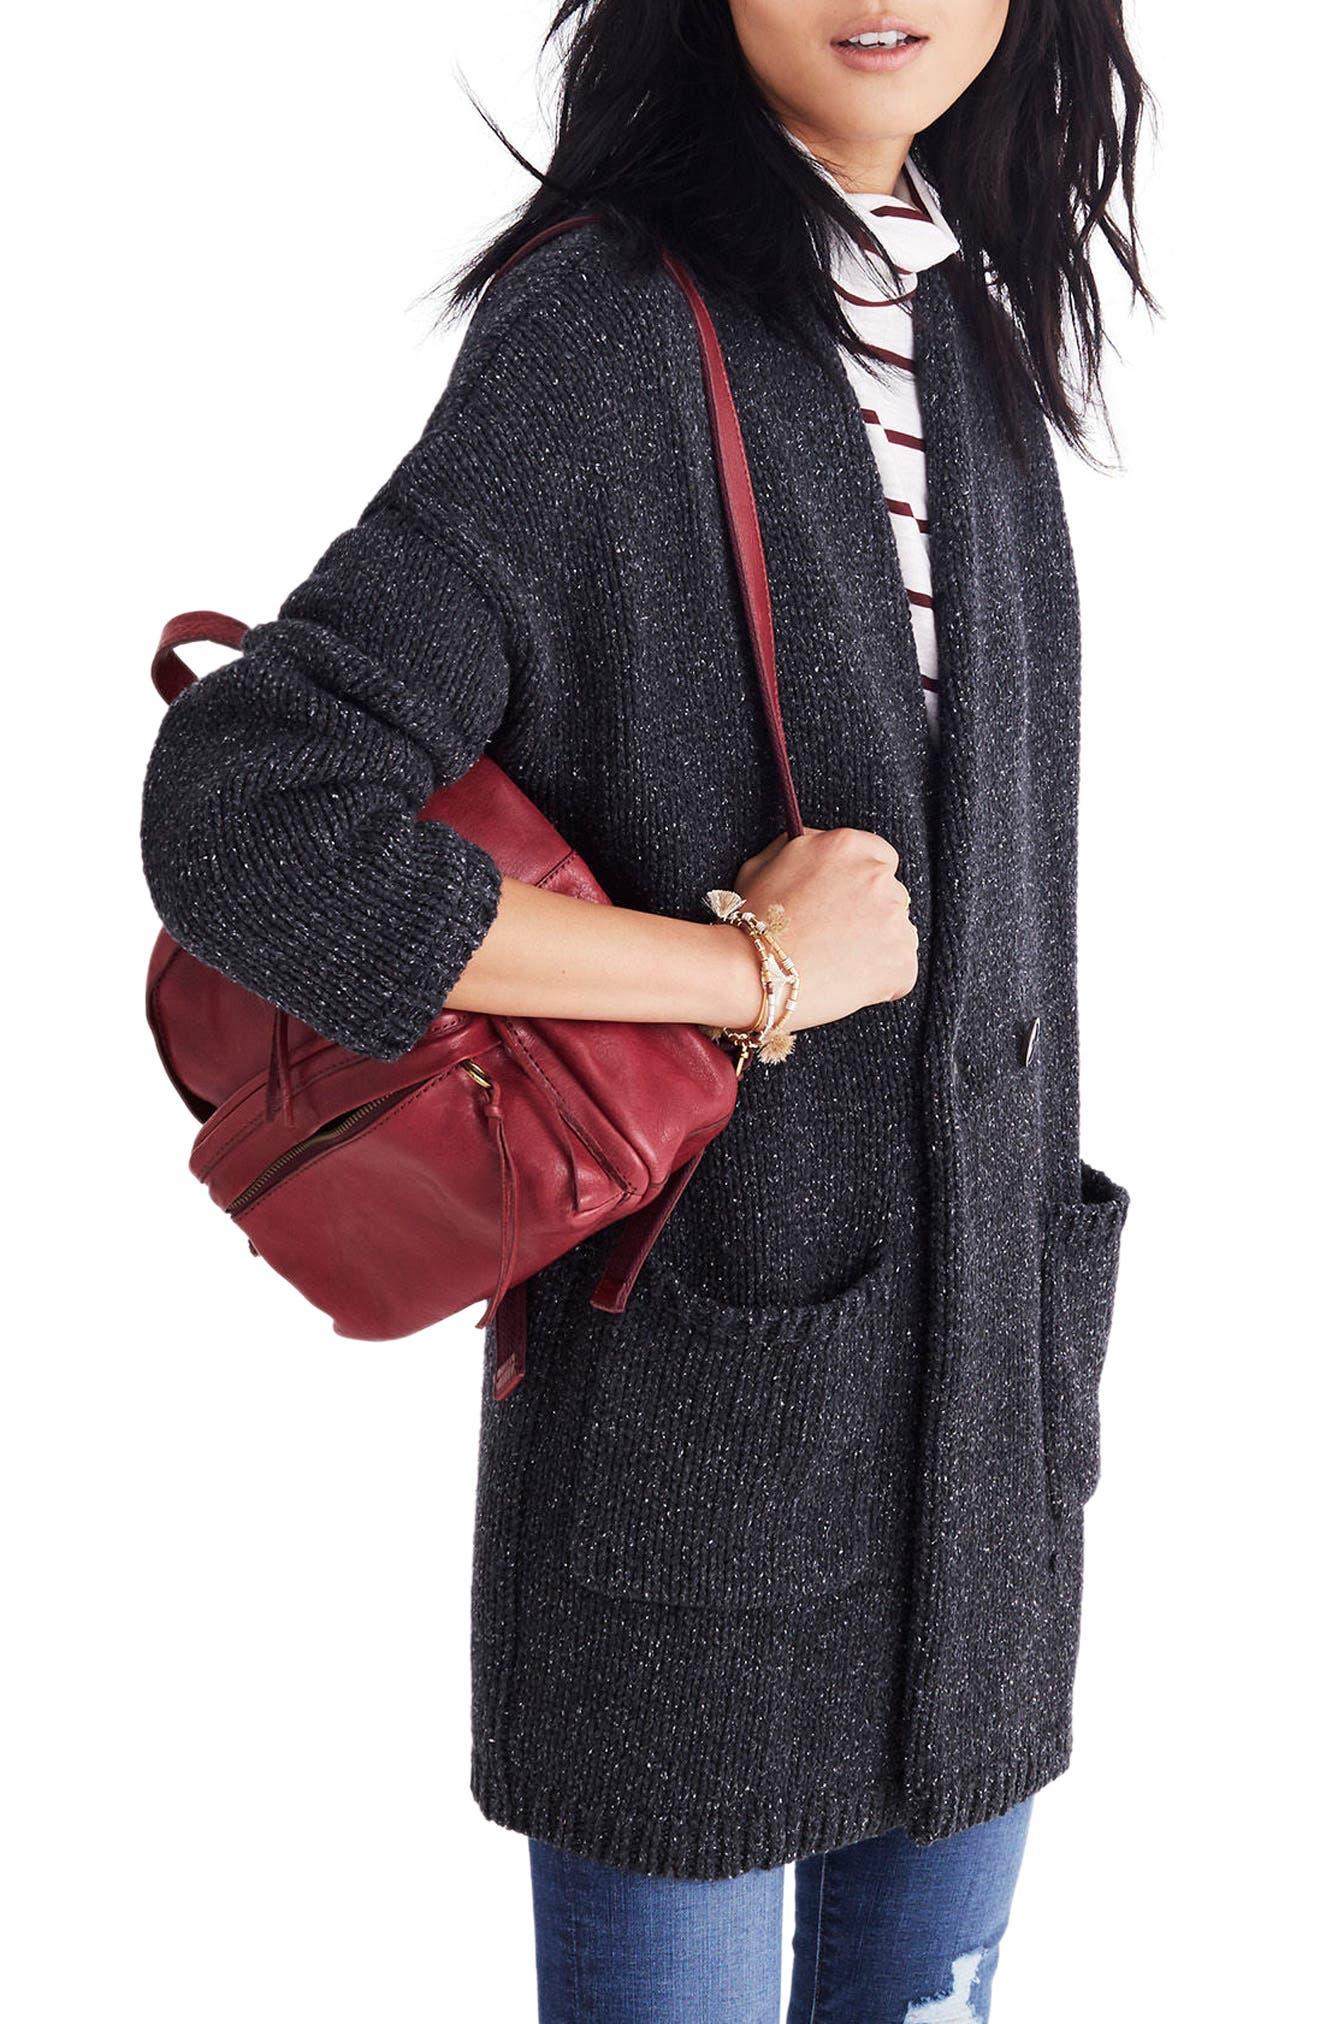 Glenhill Sweater Coat,                             Main thumbnail 1, color,                             001